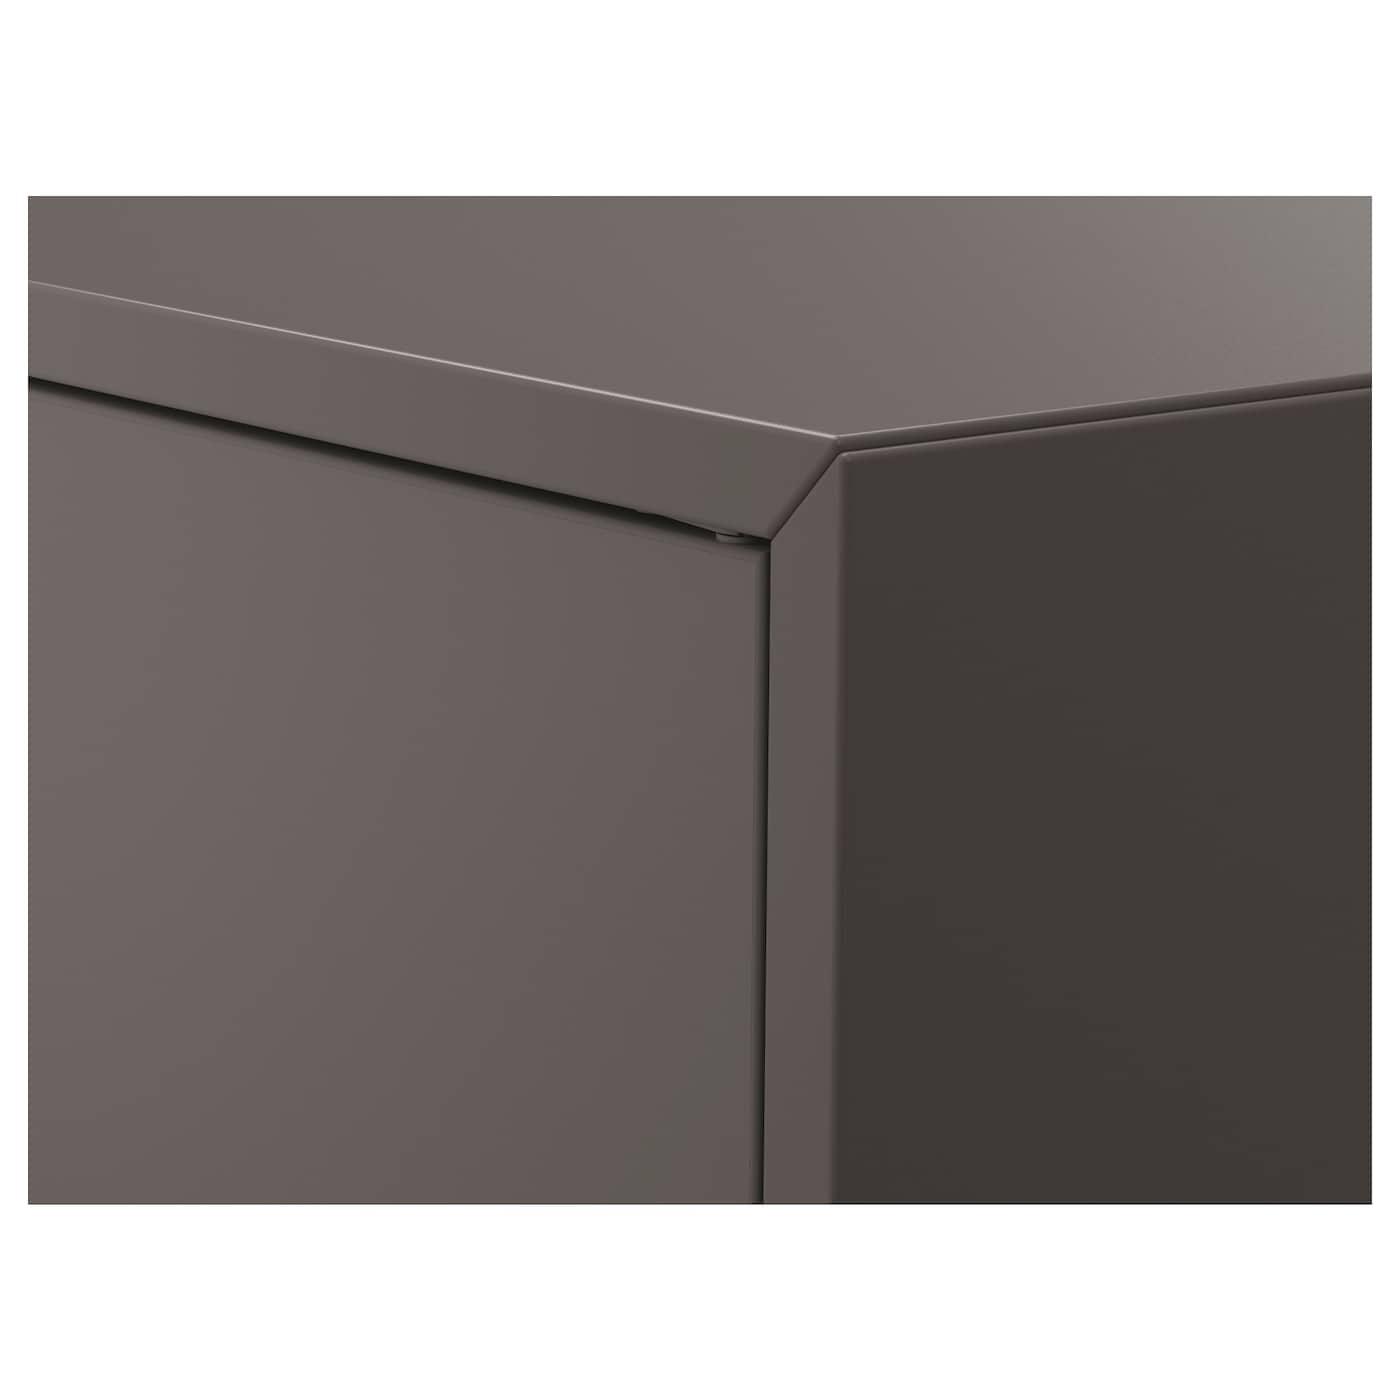 ЕКЕТ шафа, 2 дверцят, 1 полиця темно-сірий 70 см 35 см 70 см 10 кг